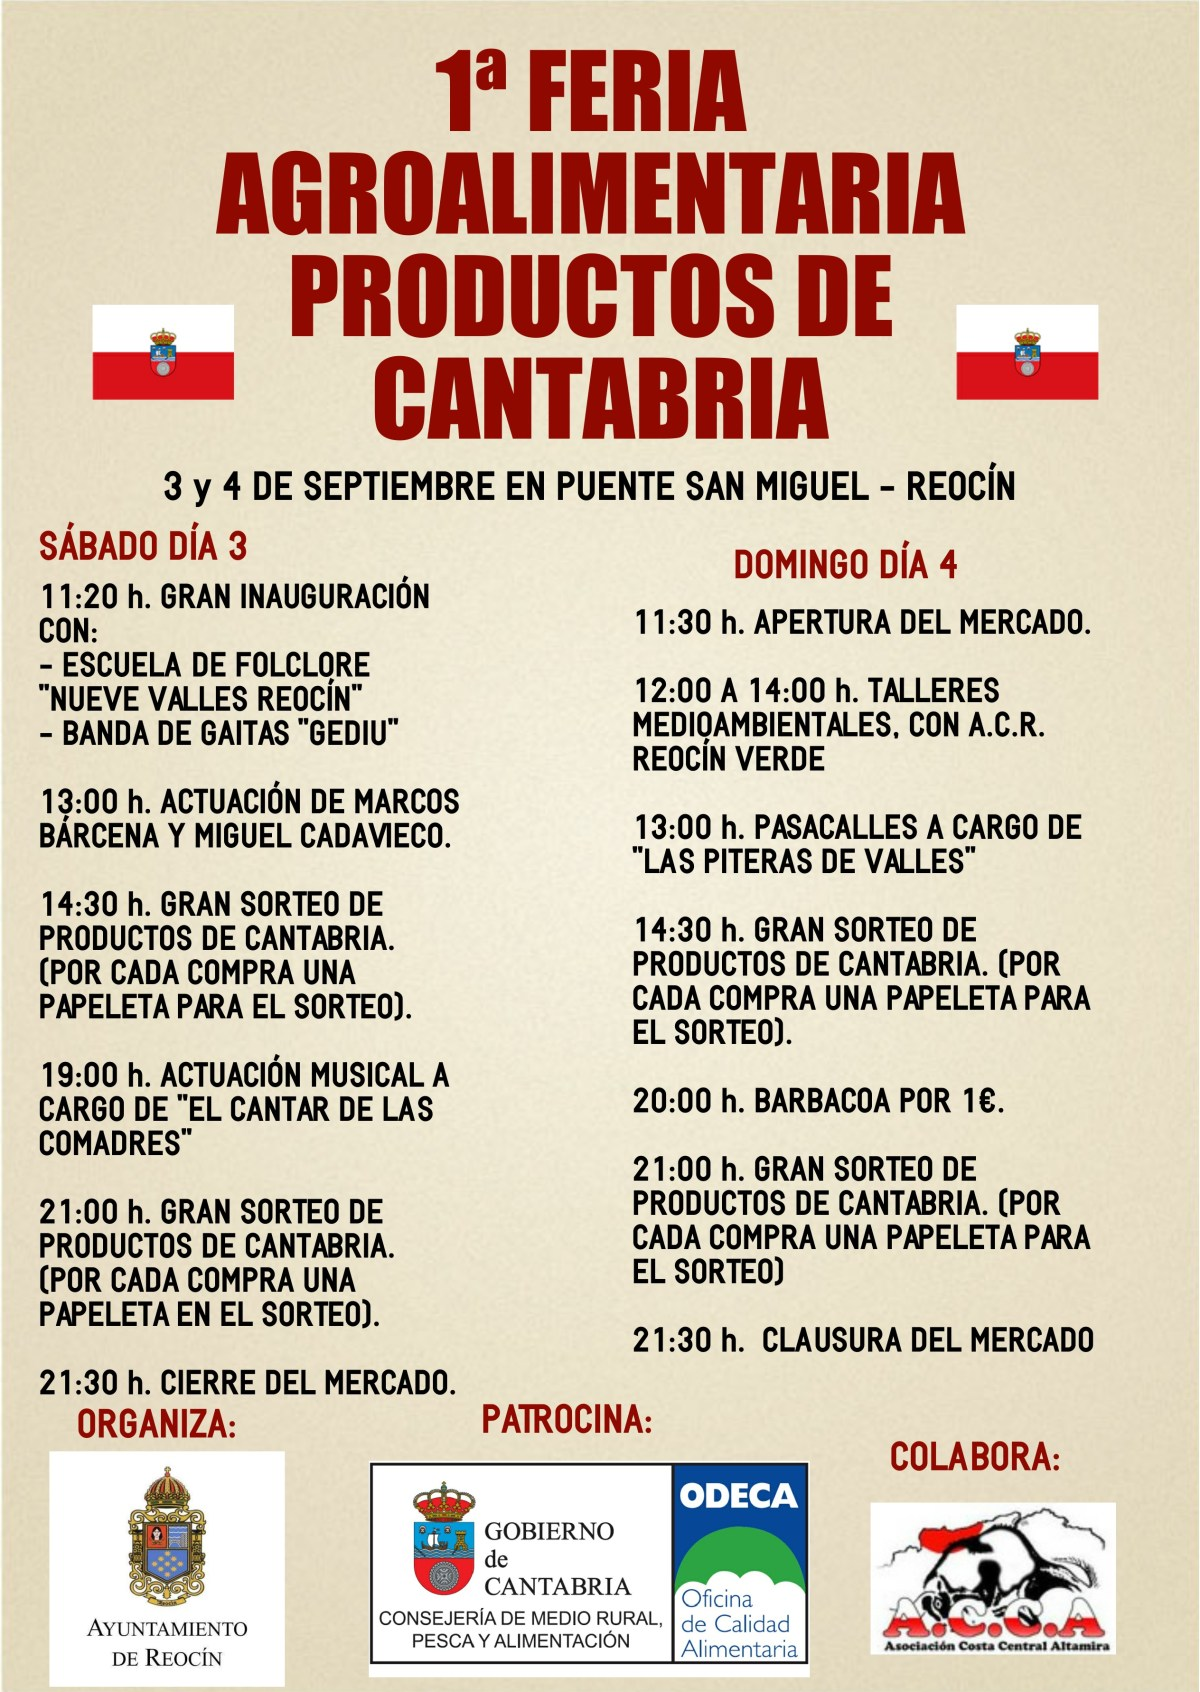 CARTEL DE FERIA DEFINITIVO